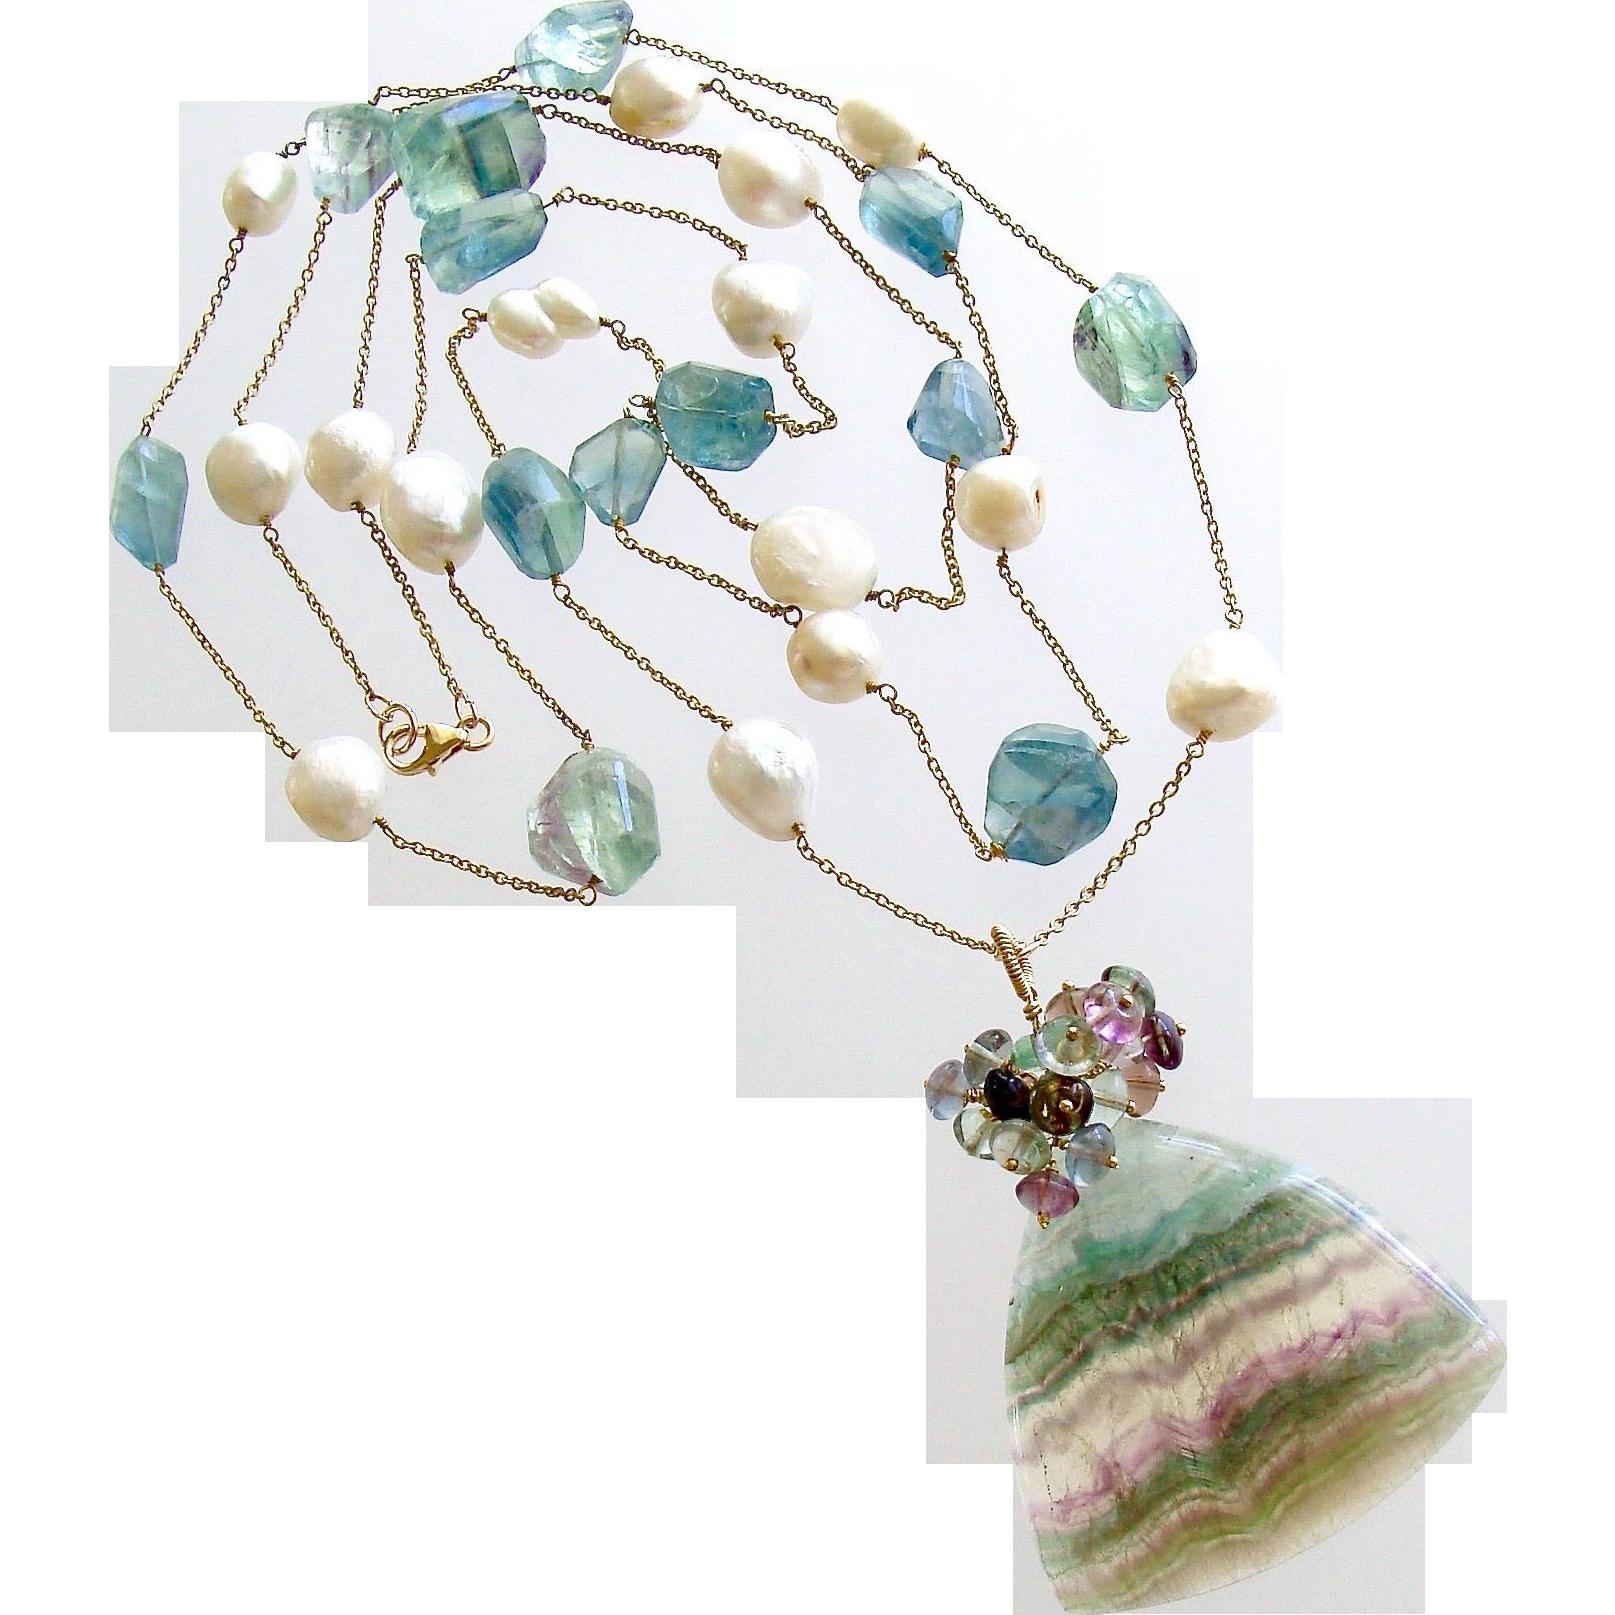 Fluorite Cultured Pearl Double Layering Necklace Set - Celestina Necklace Set